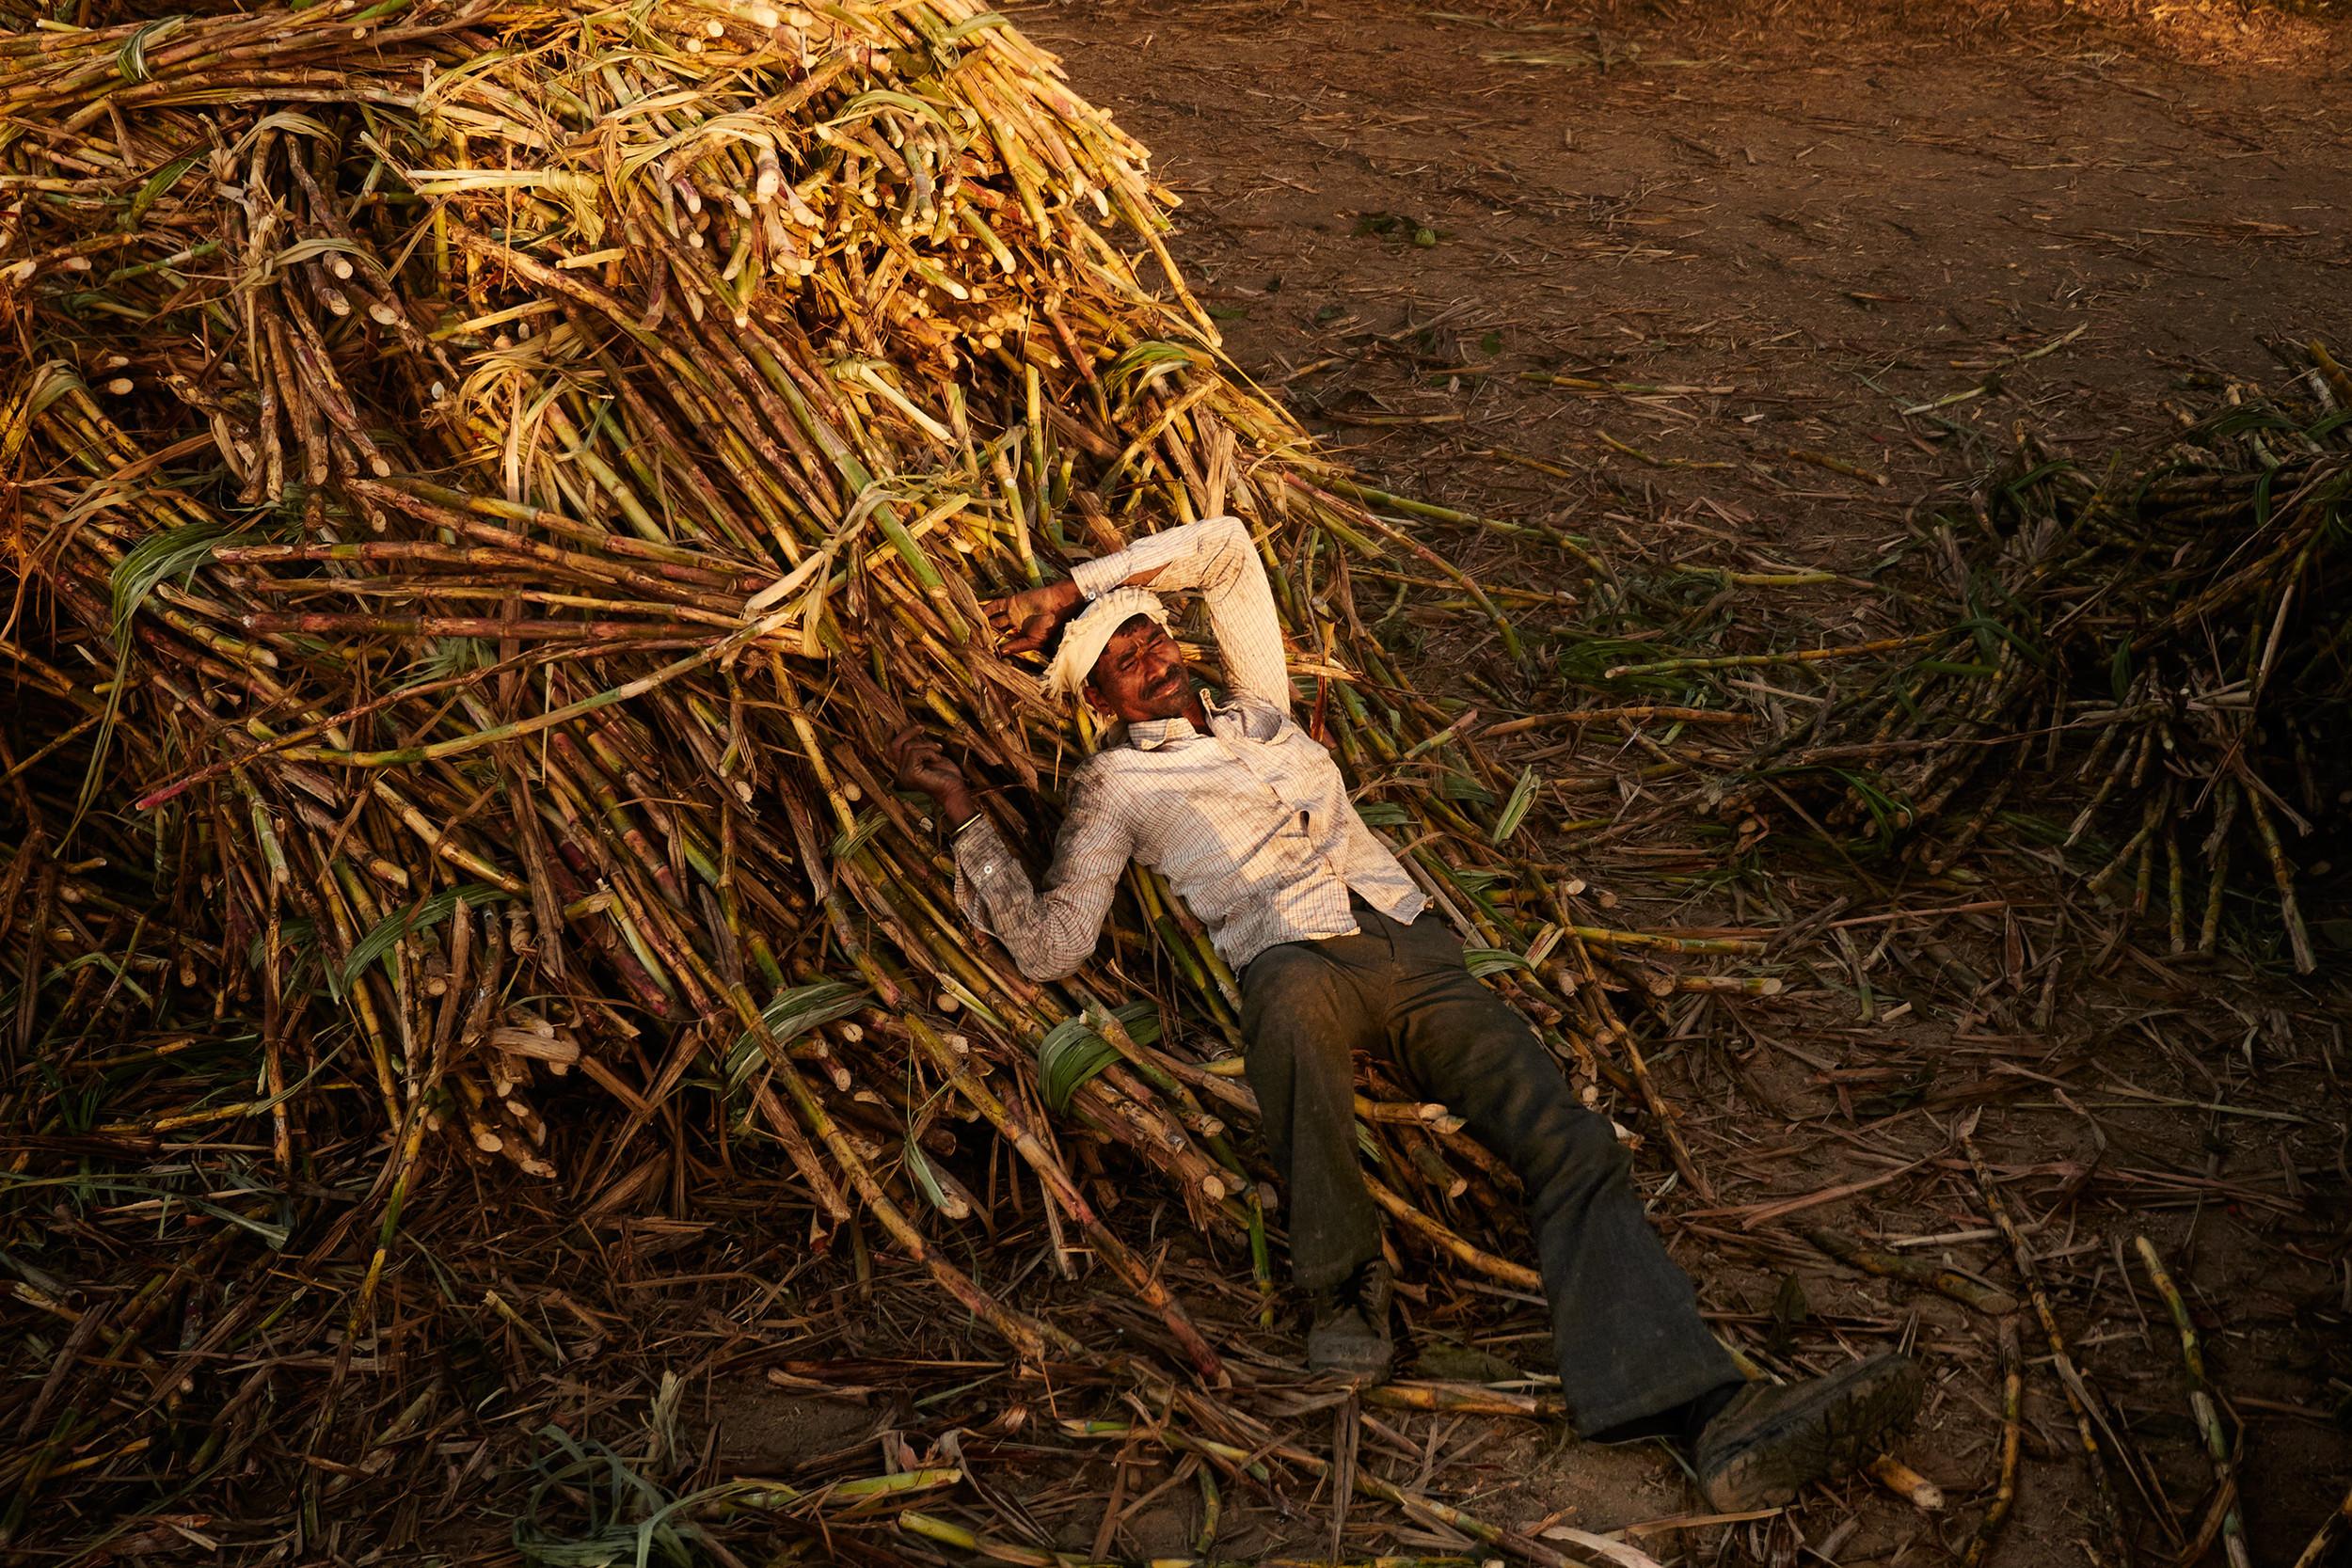 Sugarcane worker taking a rest